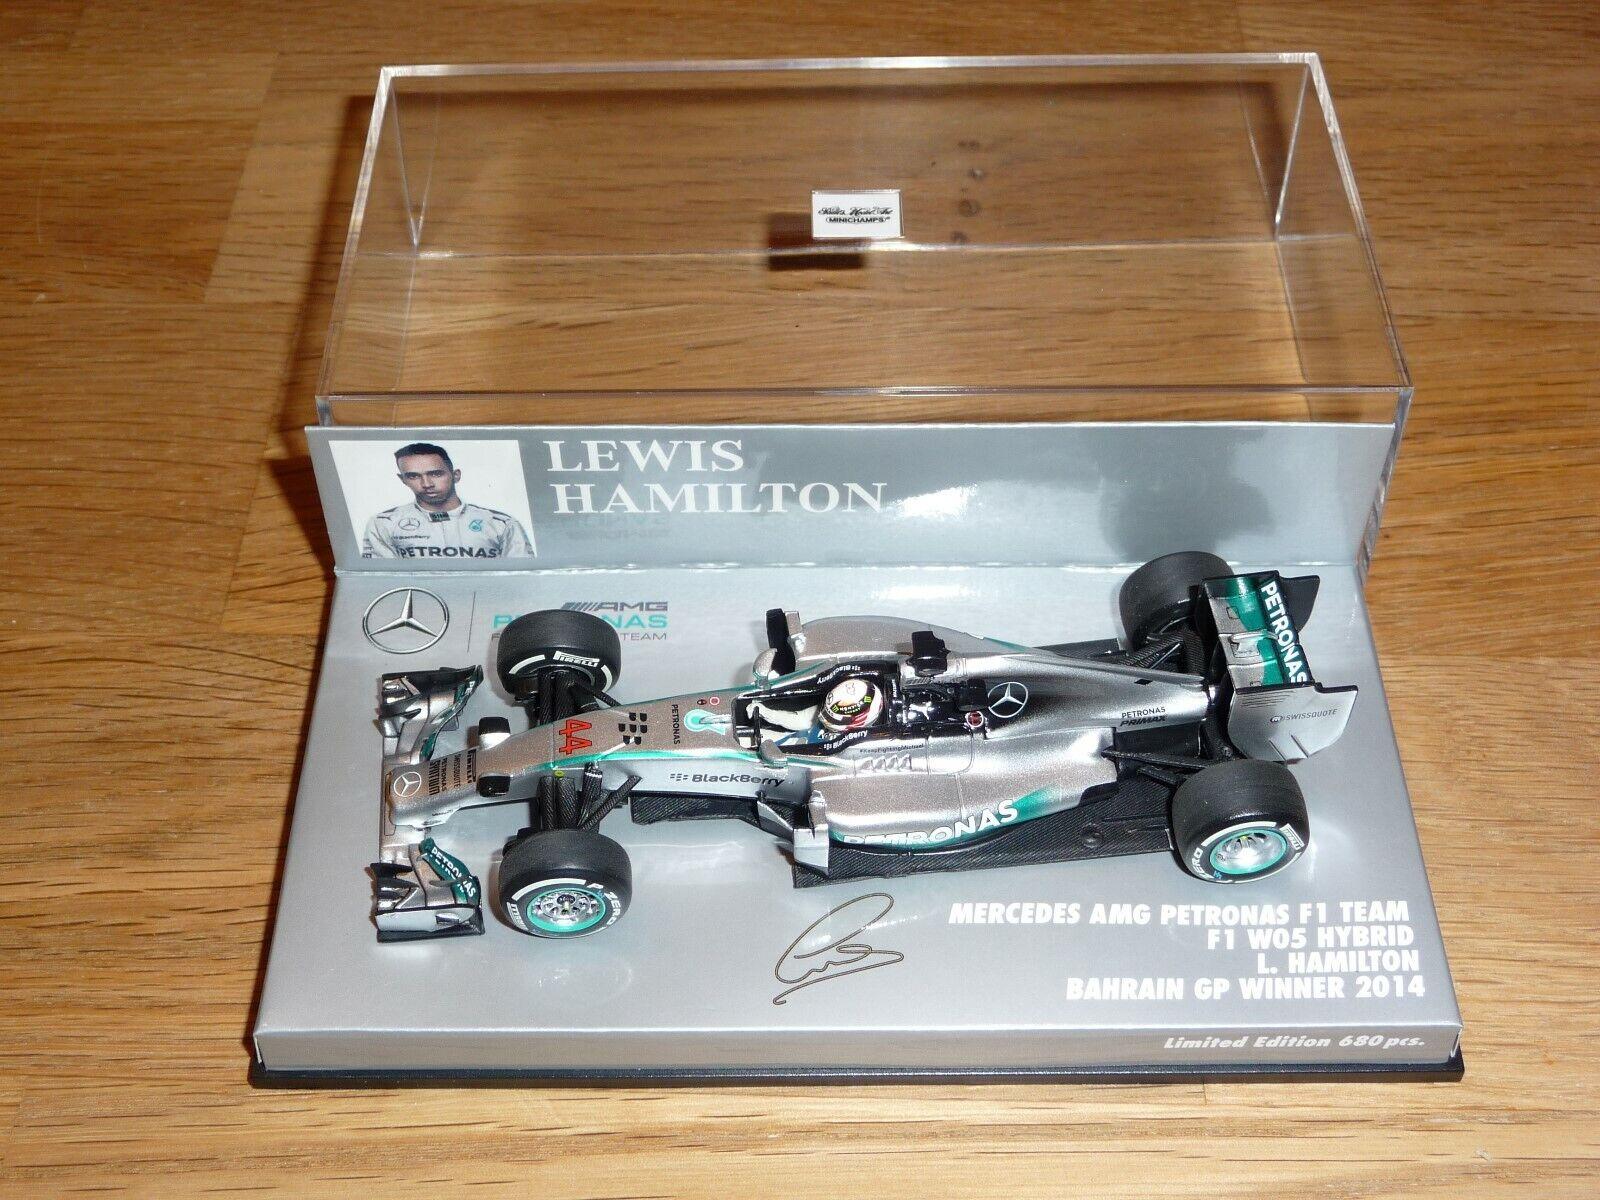 diseño simple y generoso 1 43 43 43 Minichamps Mercedes AMG Petronas W05 Bahrain GP Winner 2014 Lewis Hamilton  descuento online